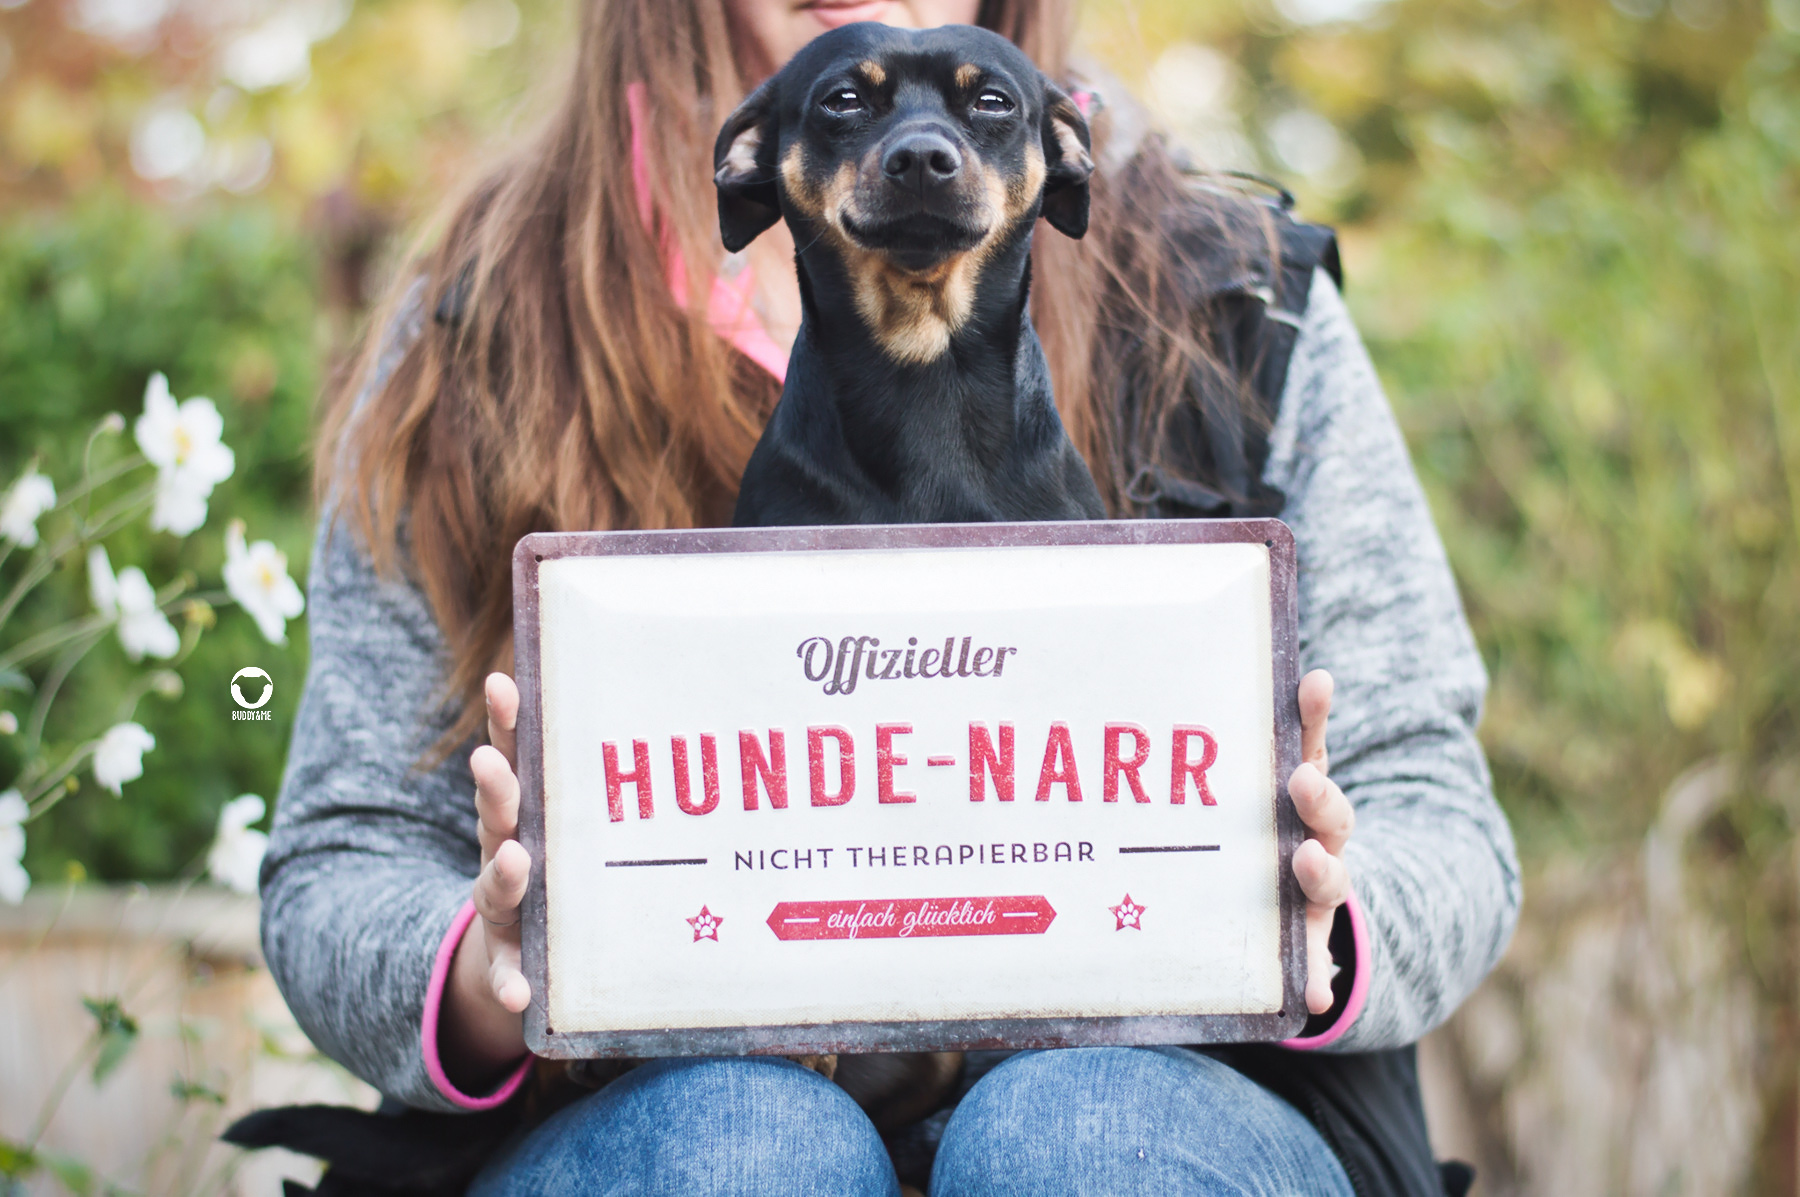 Pinscher Buddy, Buddy and Me, Hundeblog, Dogblog, Hund, Ruhrgebiet, Essen, Deko, Nostalgie, Nistalgic-Art, PfotenSchild, Blechschilder, Blechdosen, Futterdosen, Produkte, Hundenarr